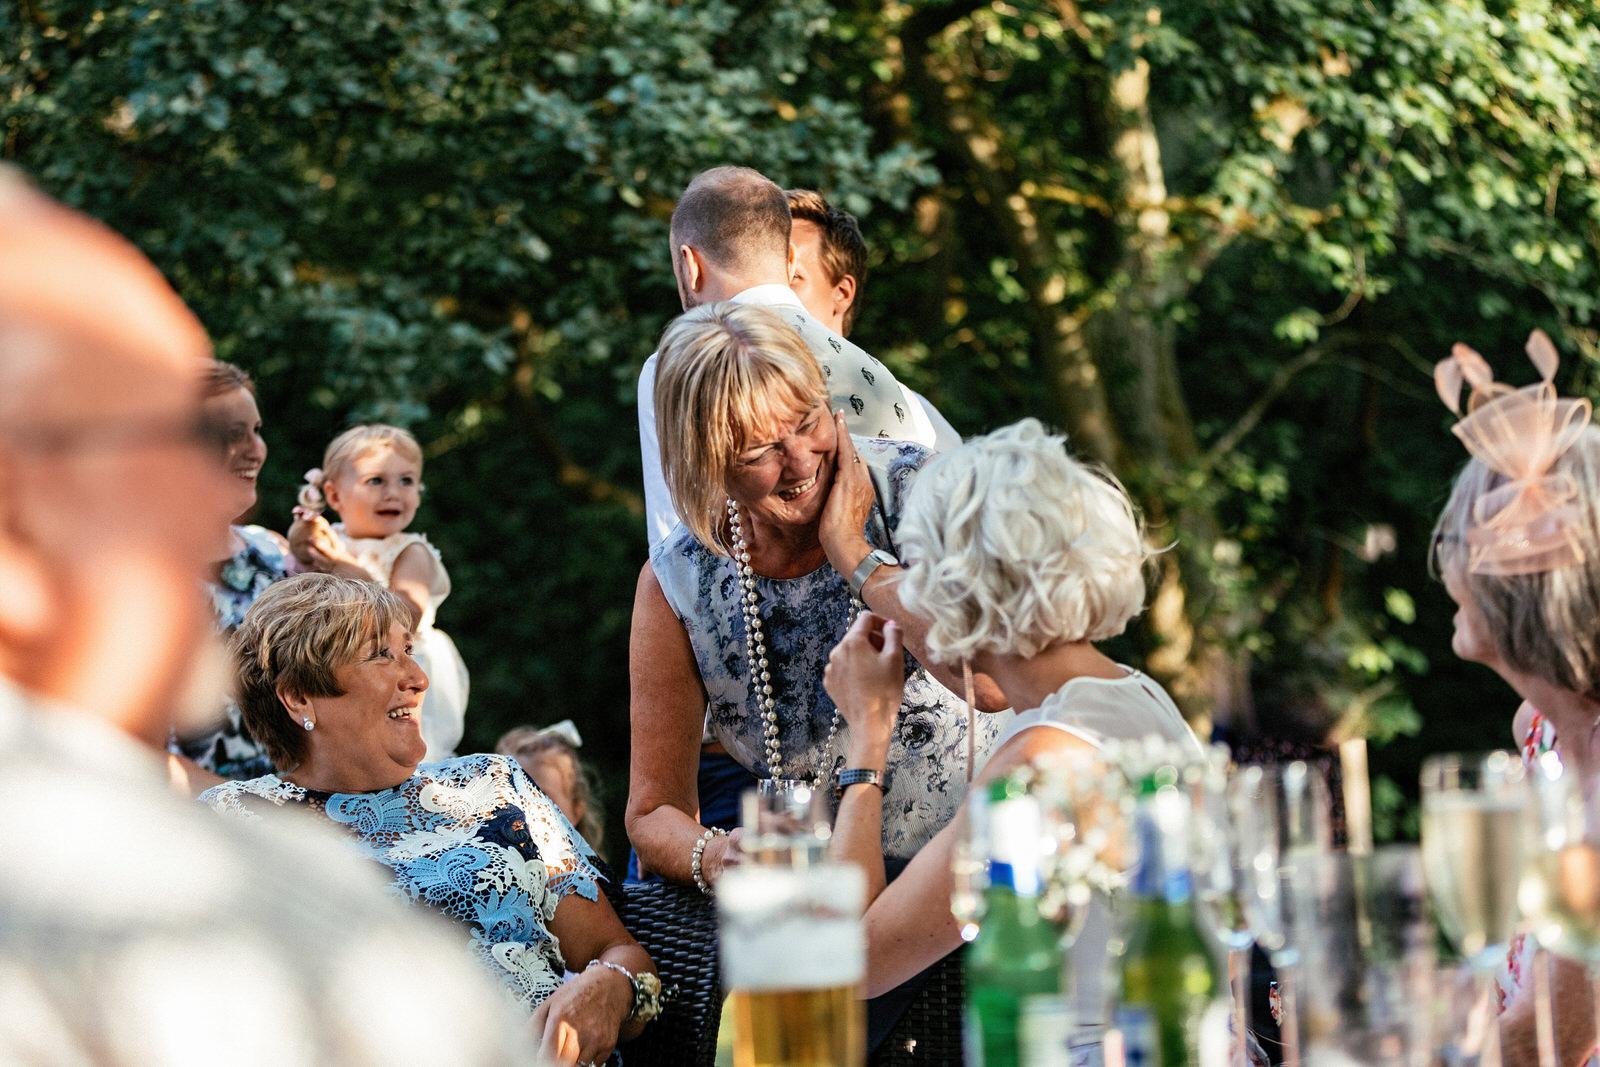 Moddershall-Oaks-Spa-Wedding-Photographer-066.jpg